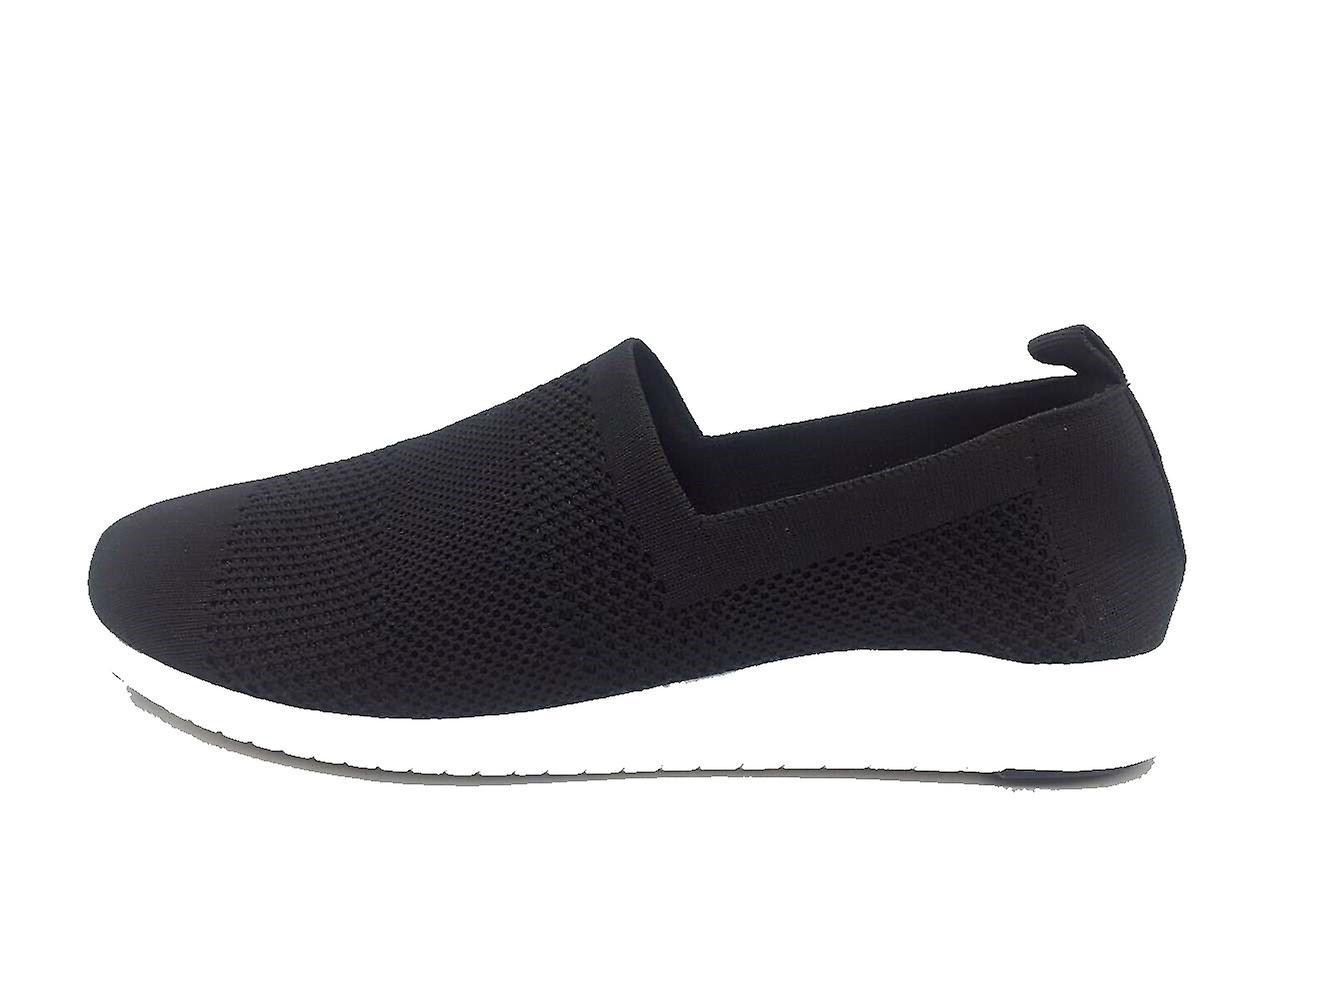 Ideologia Kobiety Masonn Fabric Low Top Slip Na Fashion Sneakers D4UwX